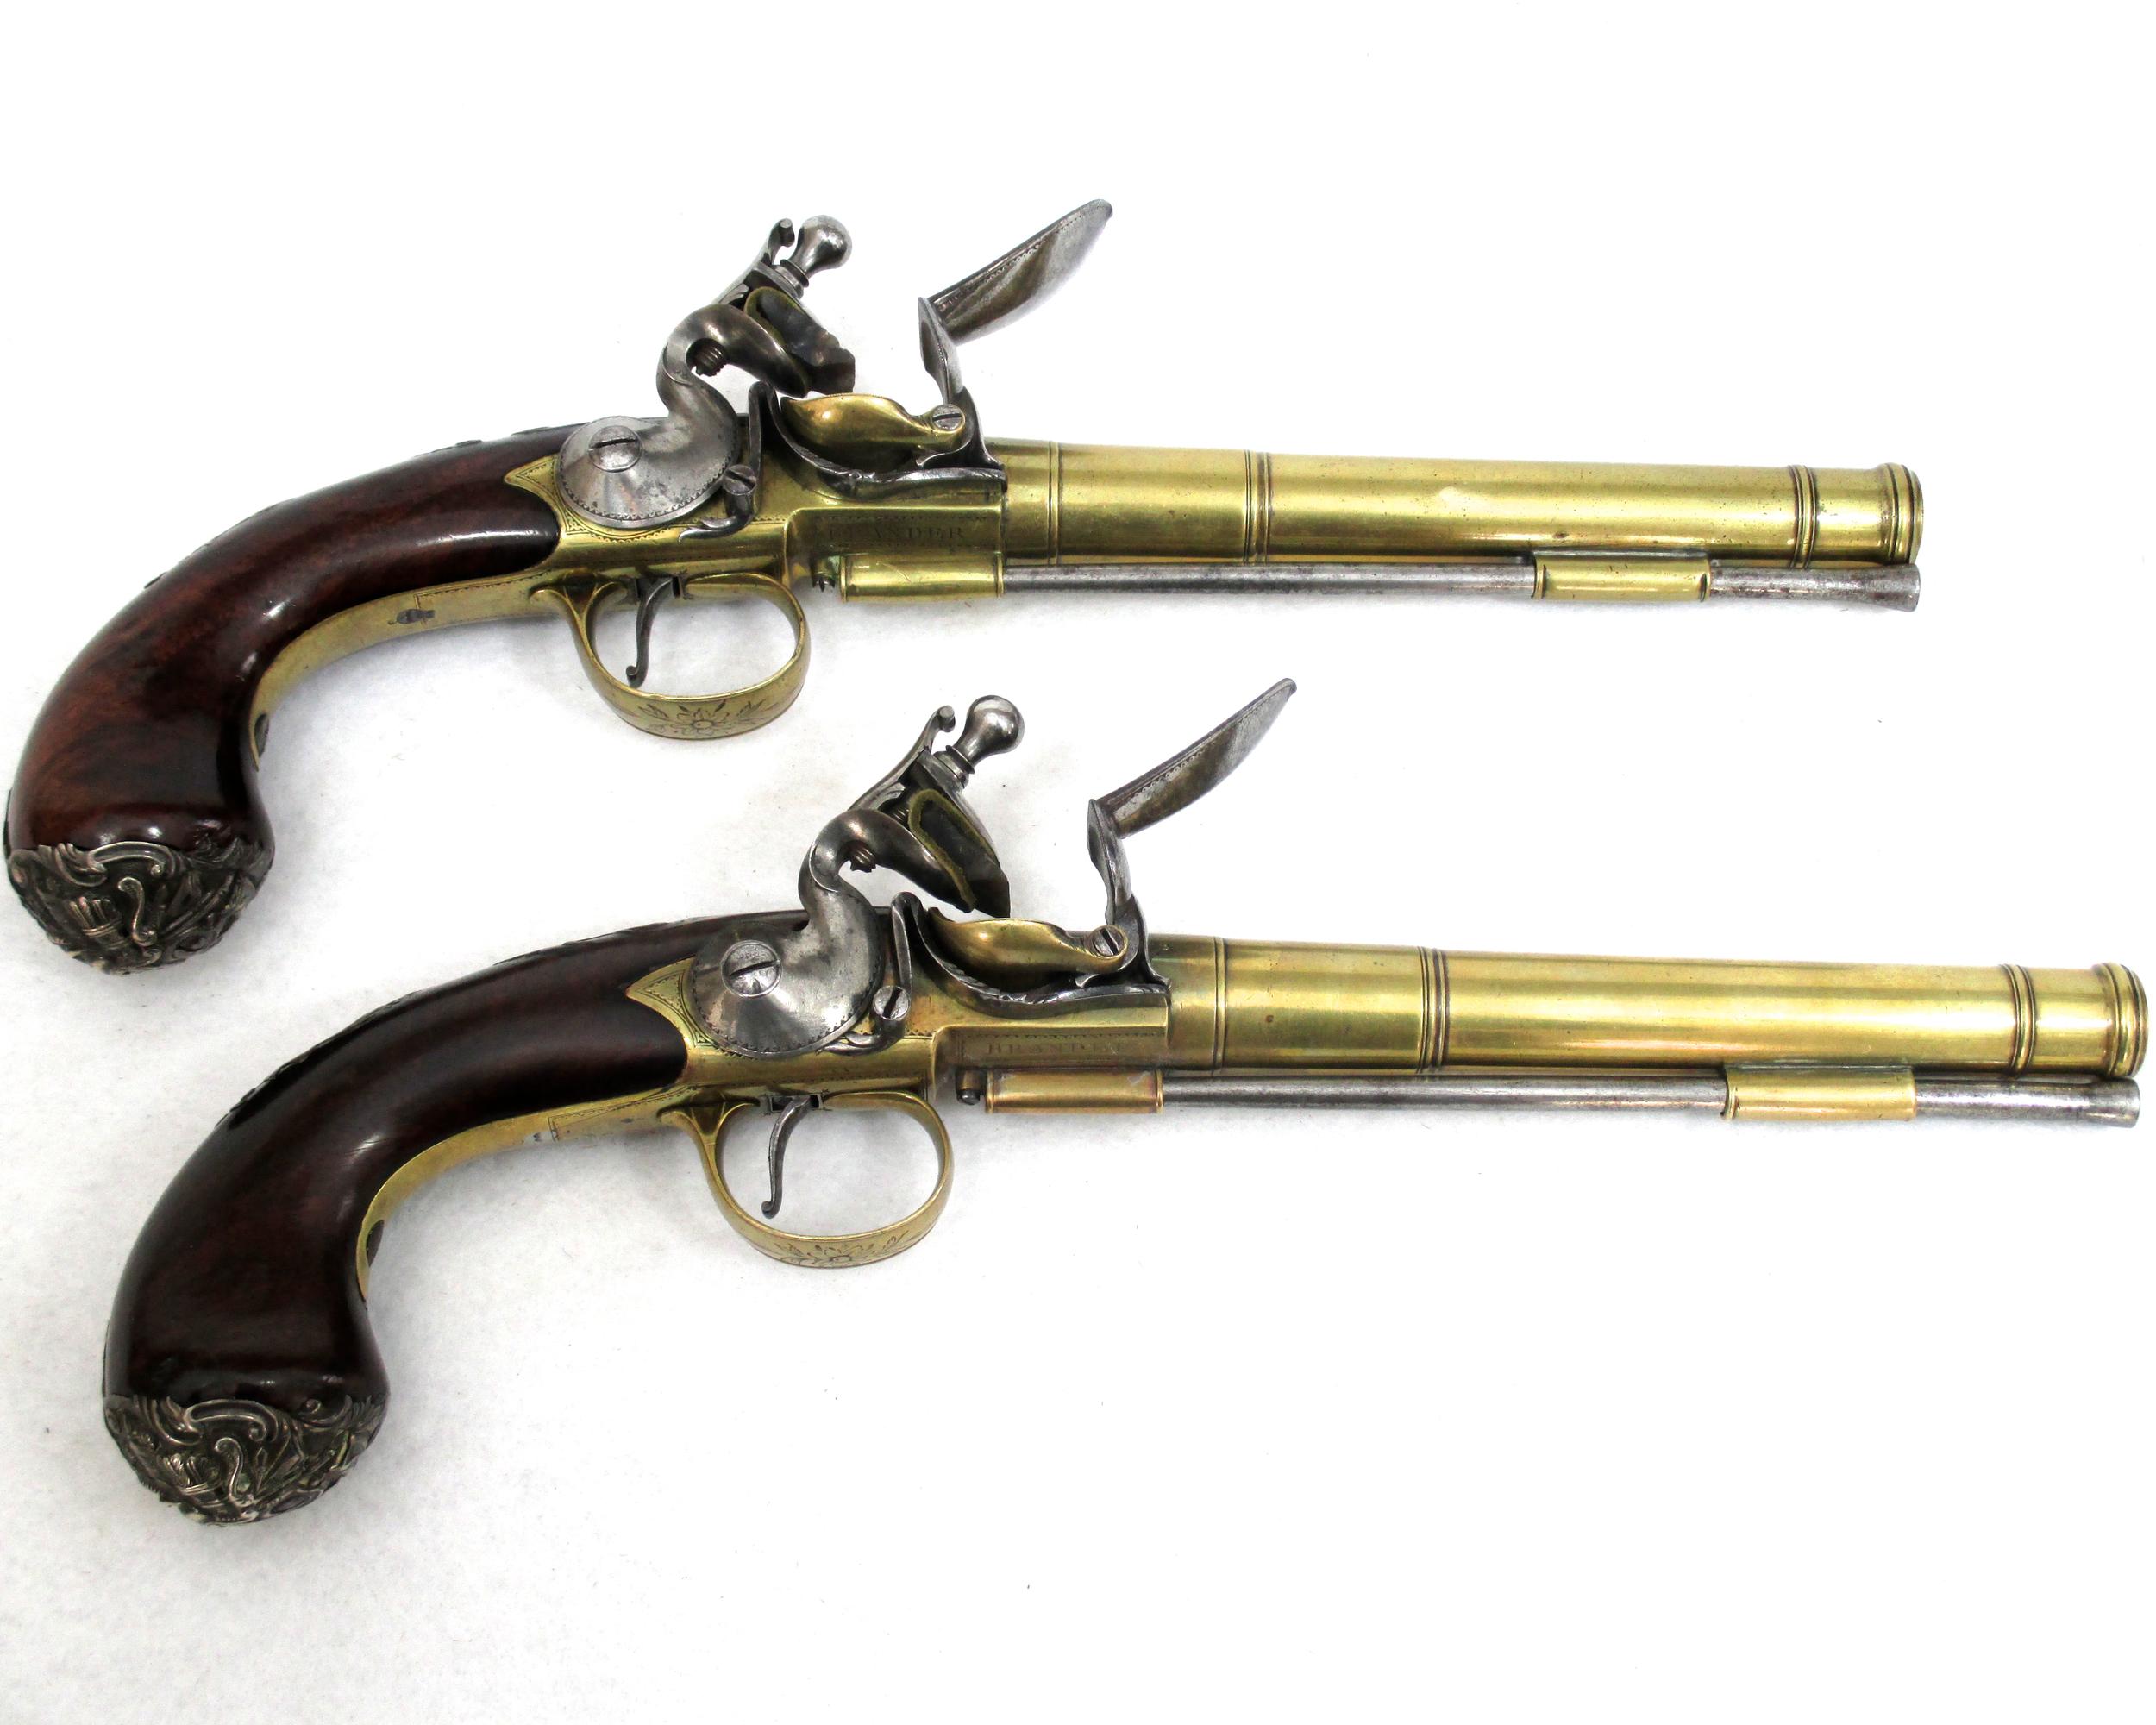 pair-flintlock-pistols-william-brander-english-guns-weapons-gary-friedland-arms-armor.jpg